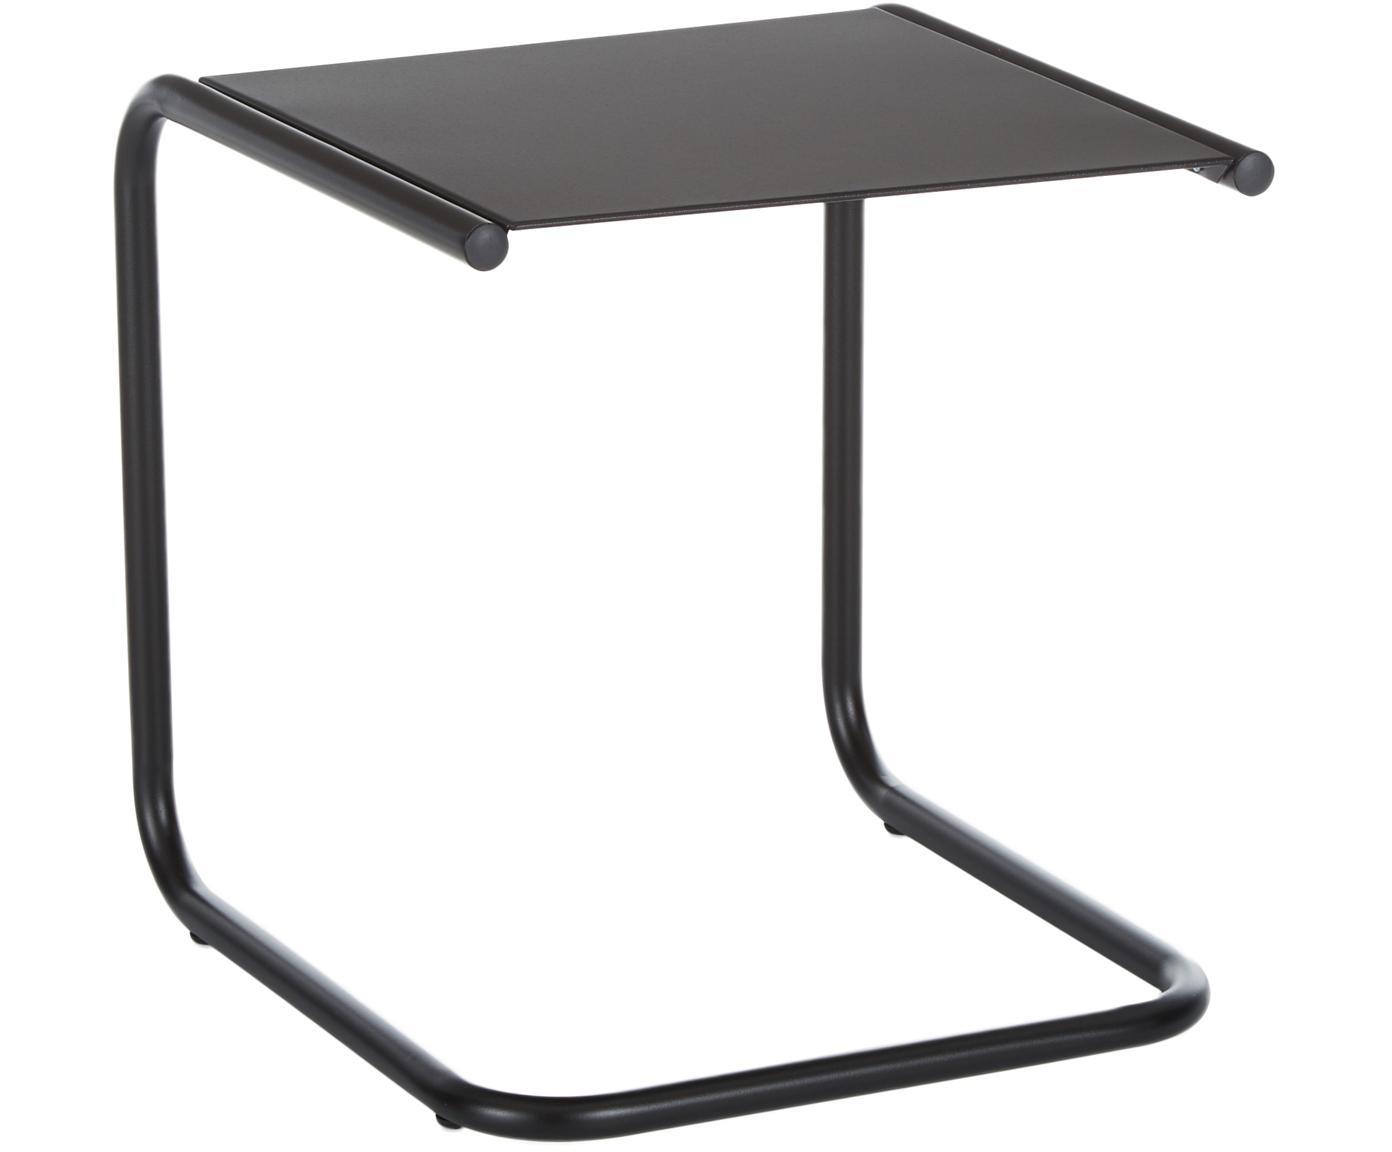 Mesa auxiliar de exterior de metal Club, Tablero: metal con pintura en polv, Estructura: aluminio con pintura en p, Negro, An 40 x F 40 cm